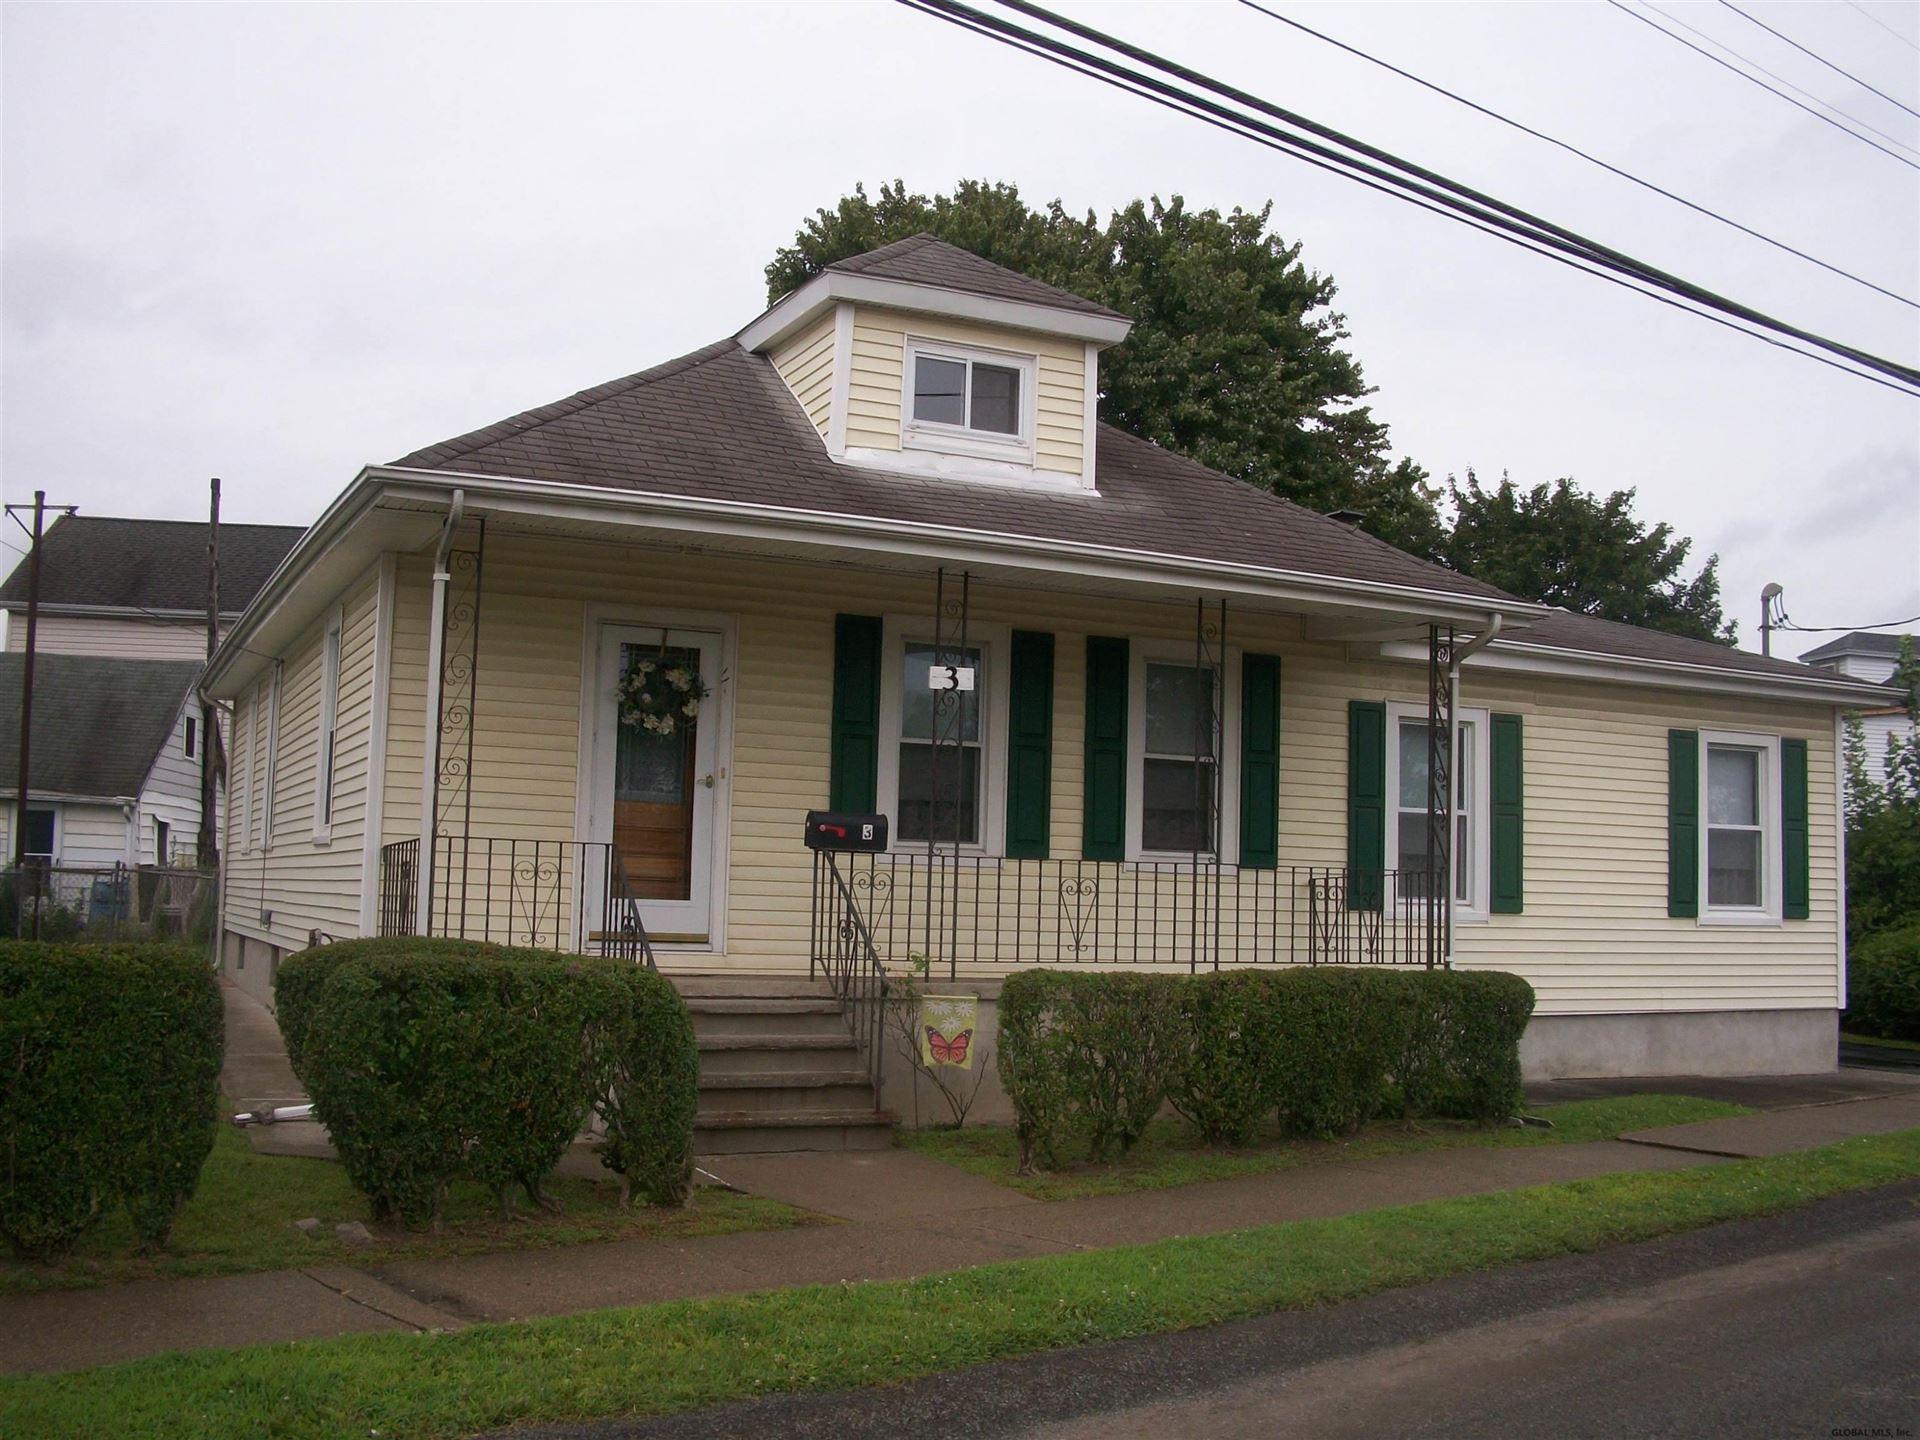 3 ERIE ST, Colonie, NY 12189 - #: 202127268